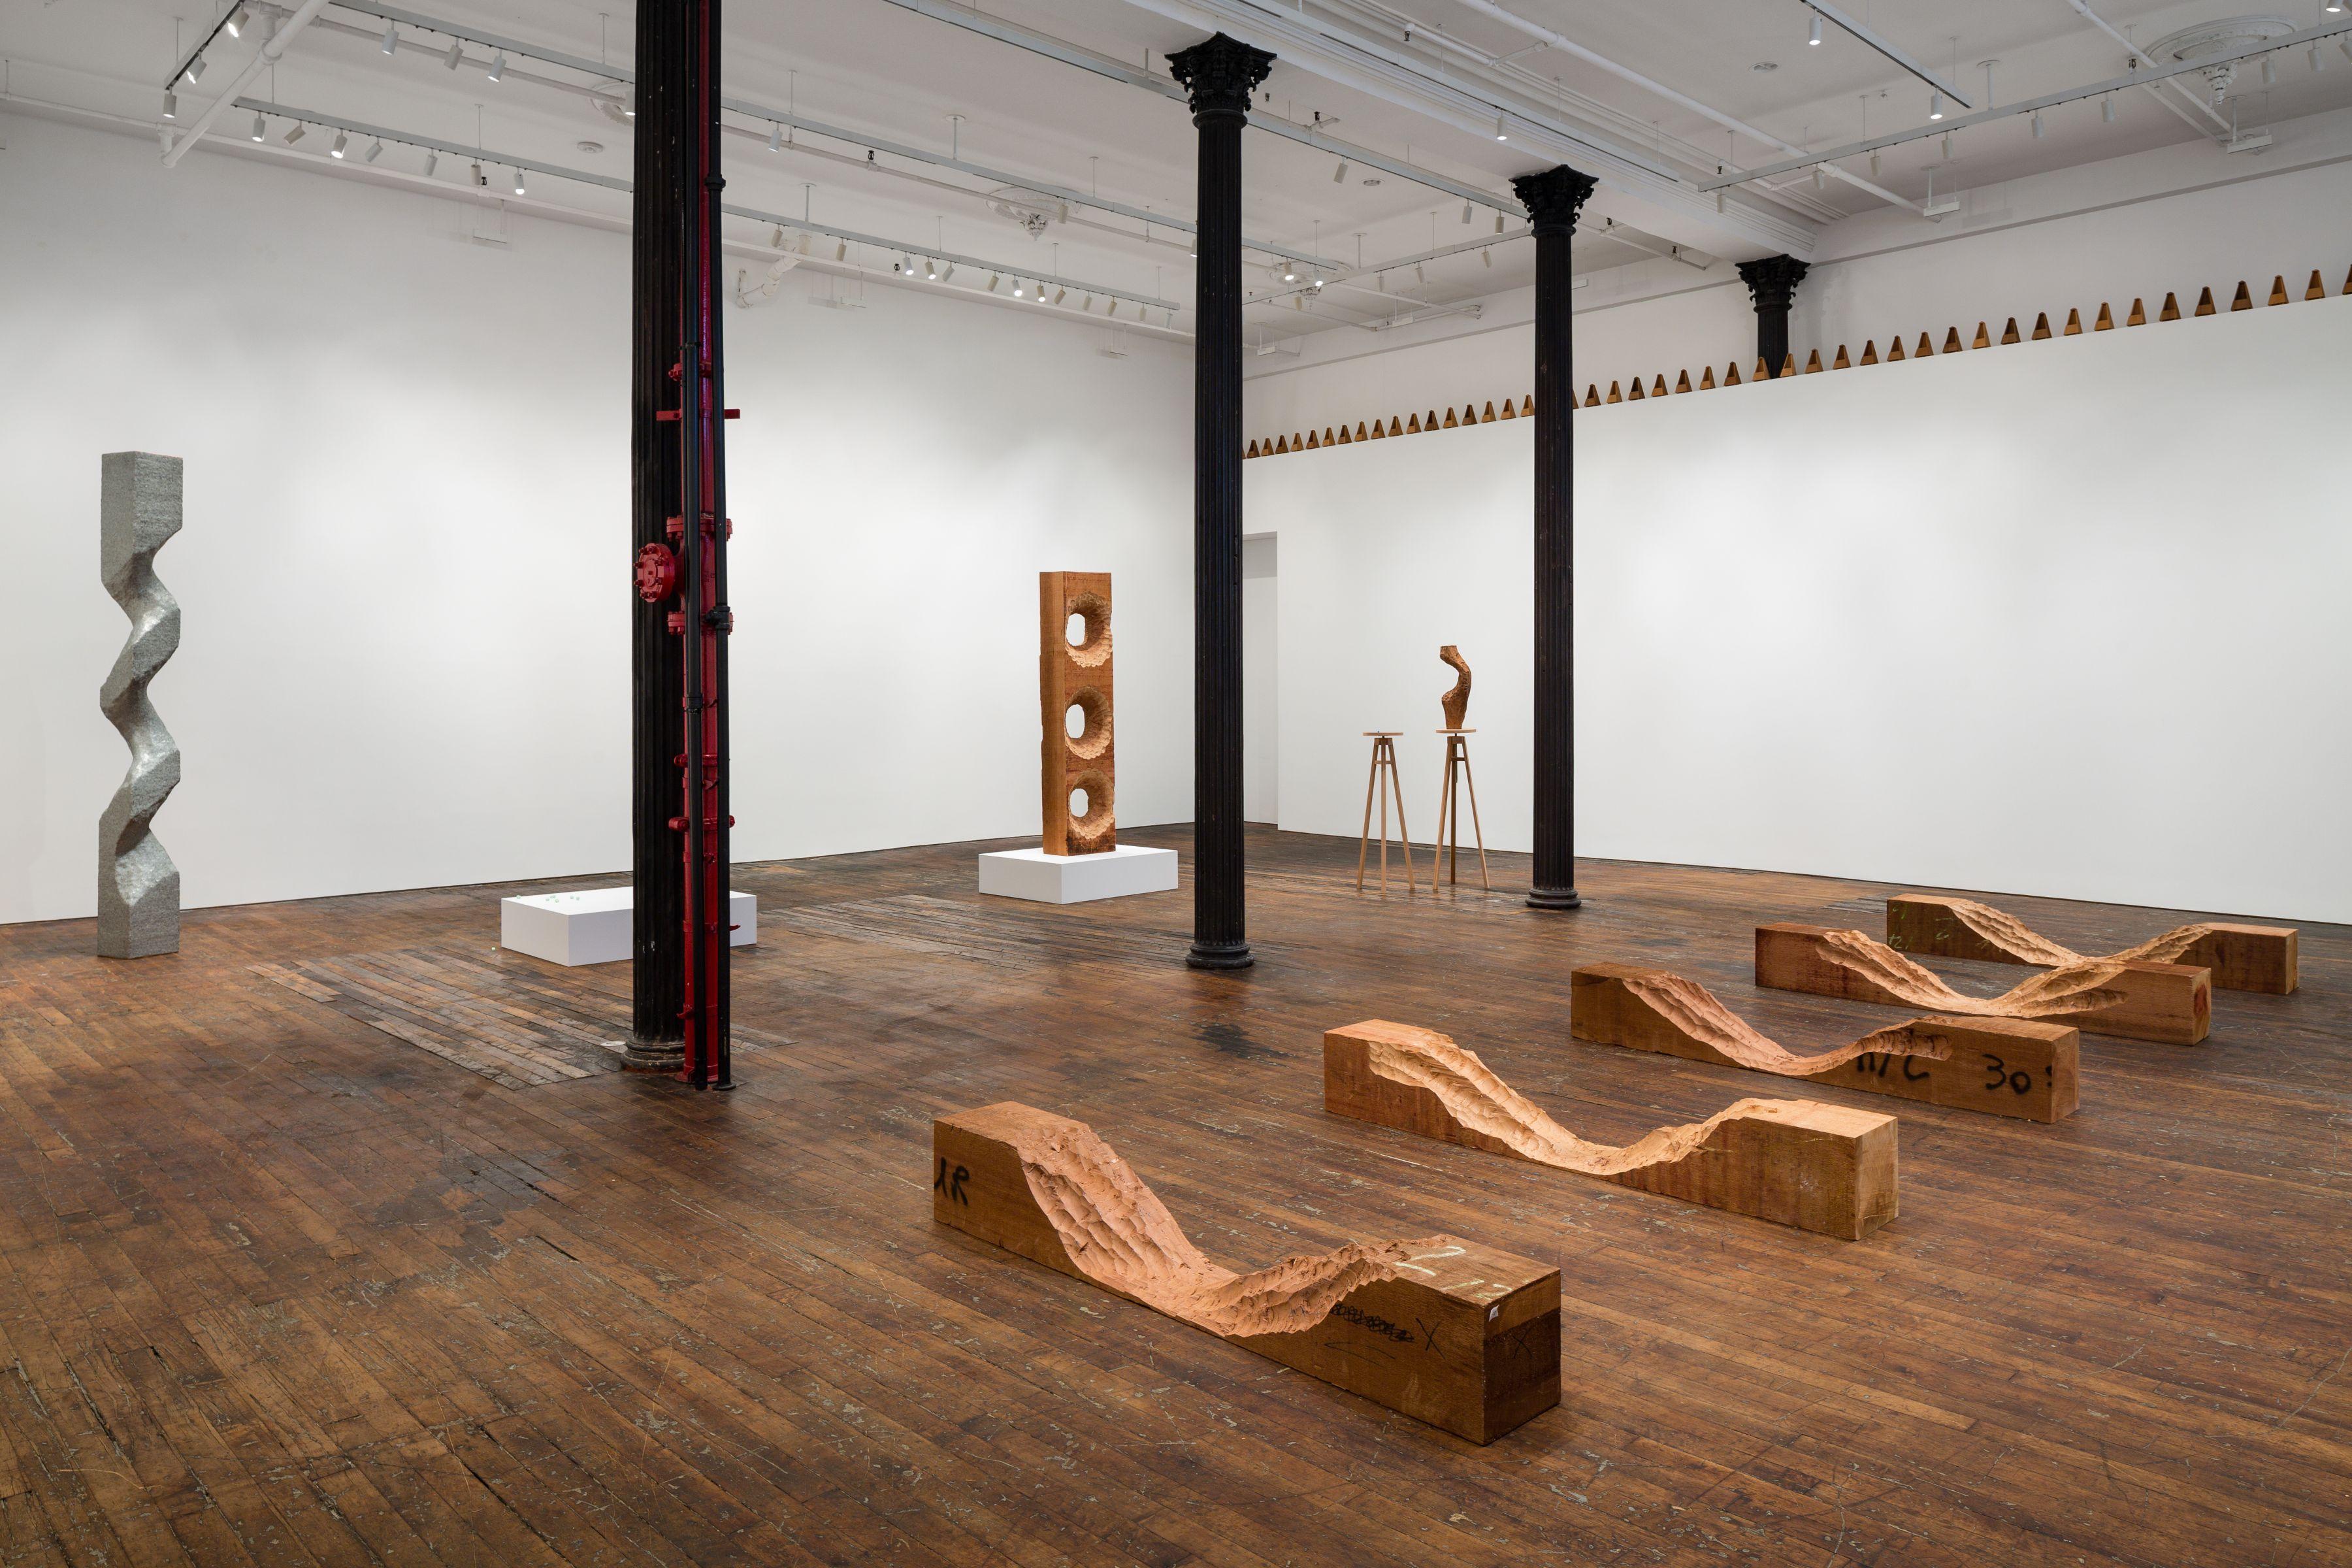 David Adamo – installation view 1